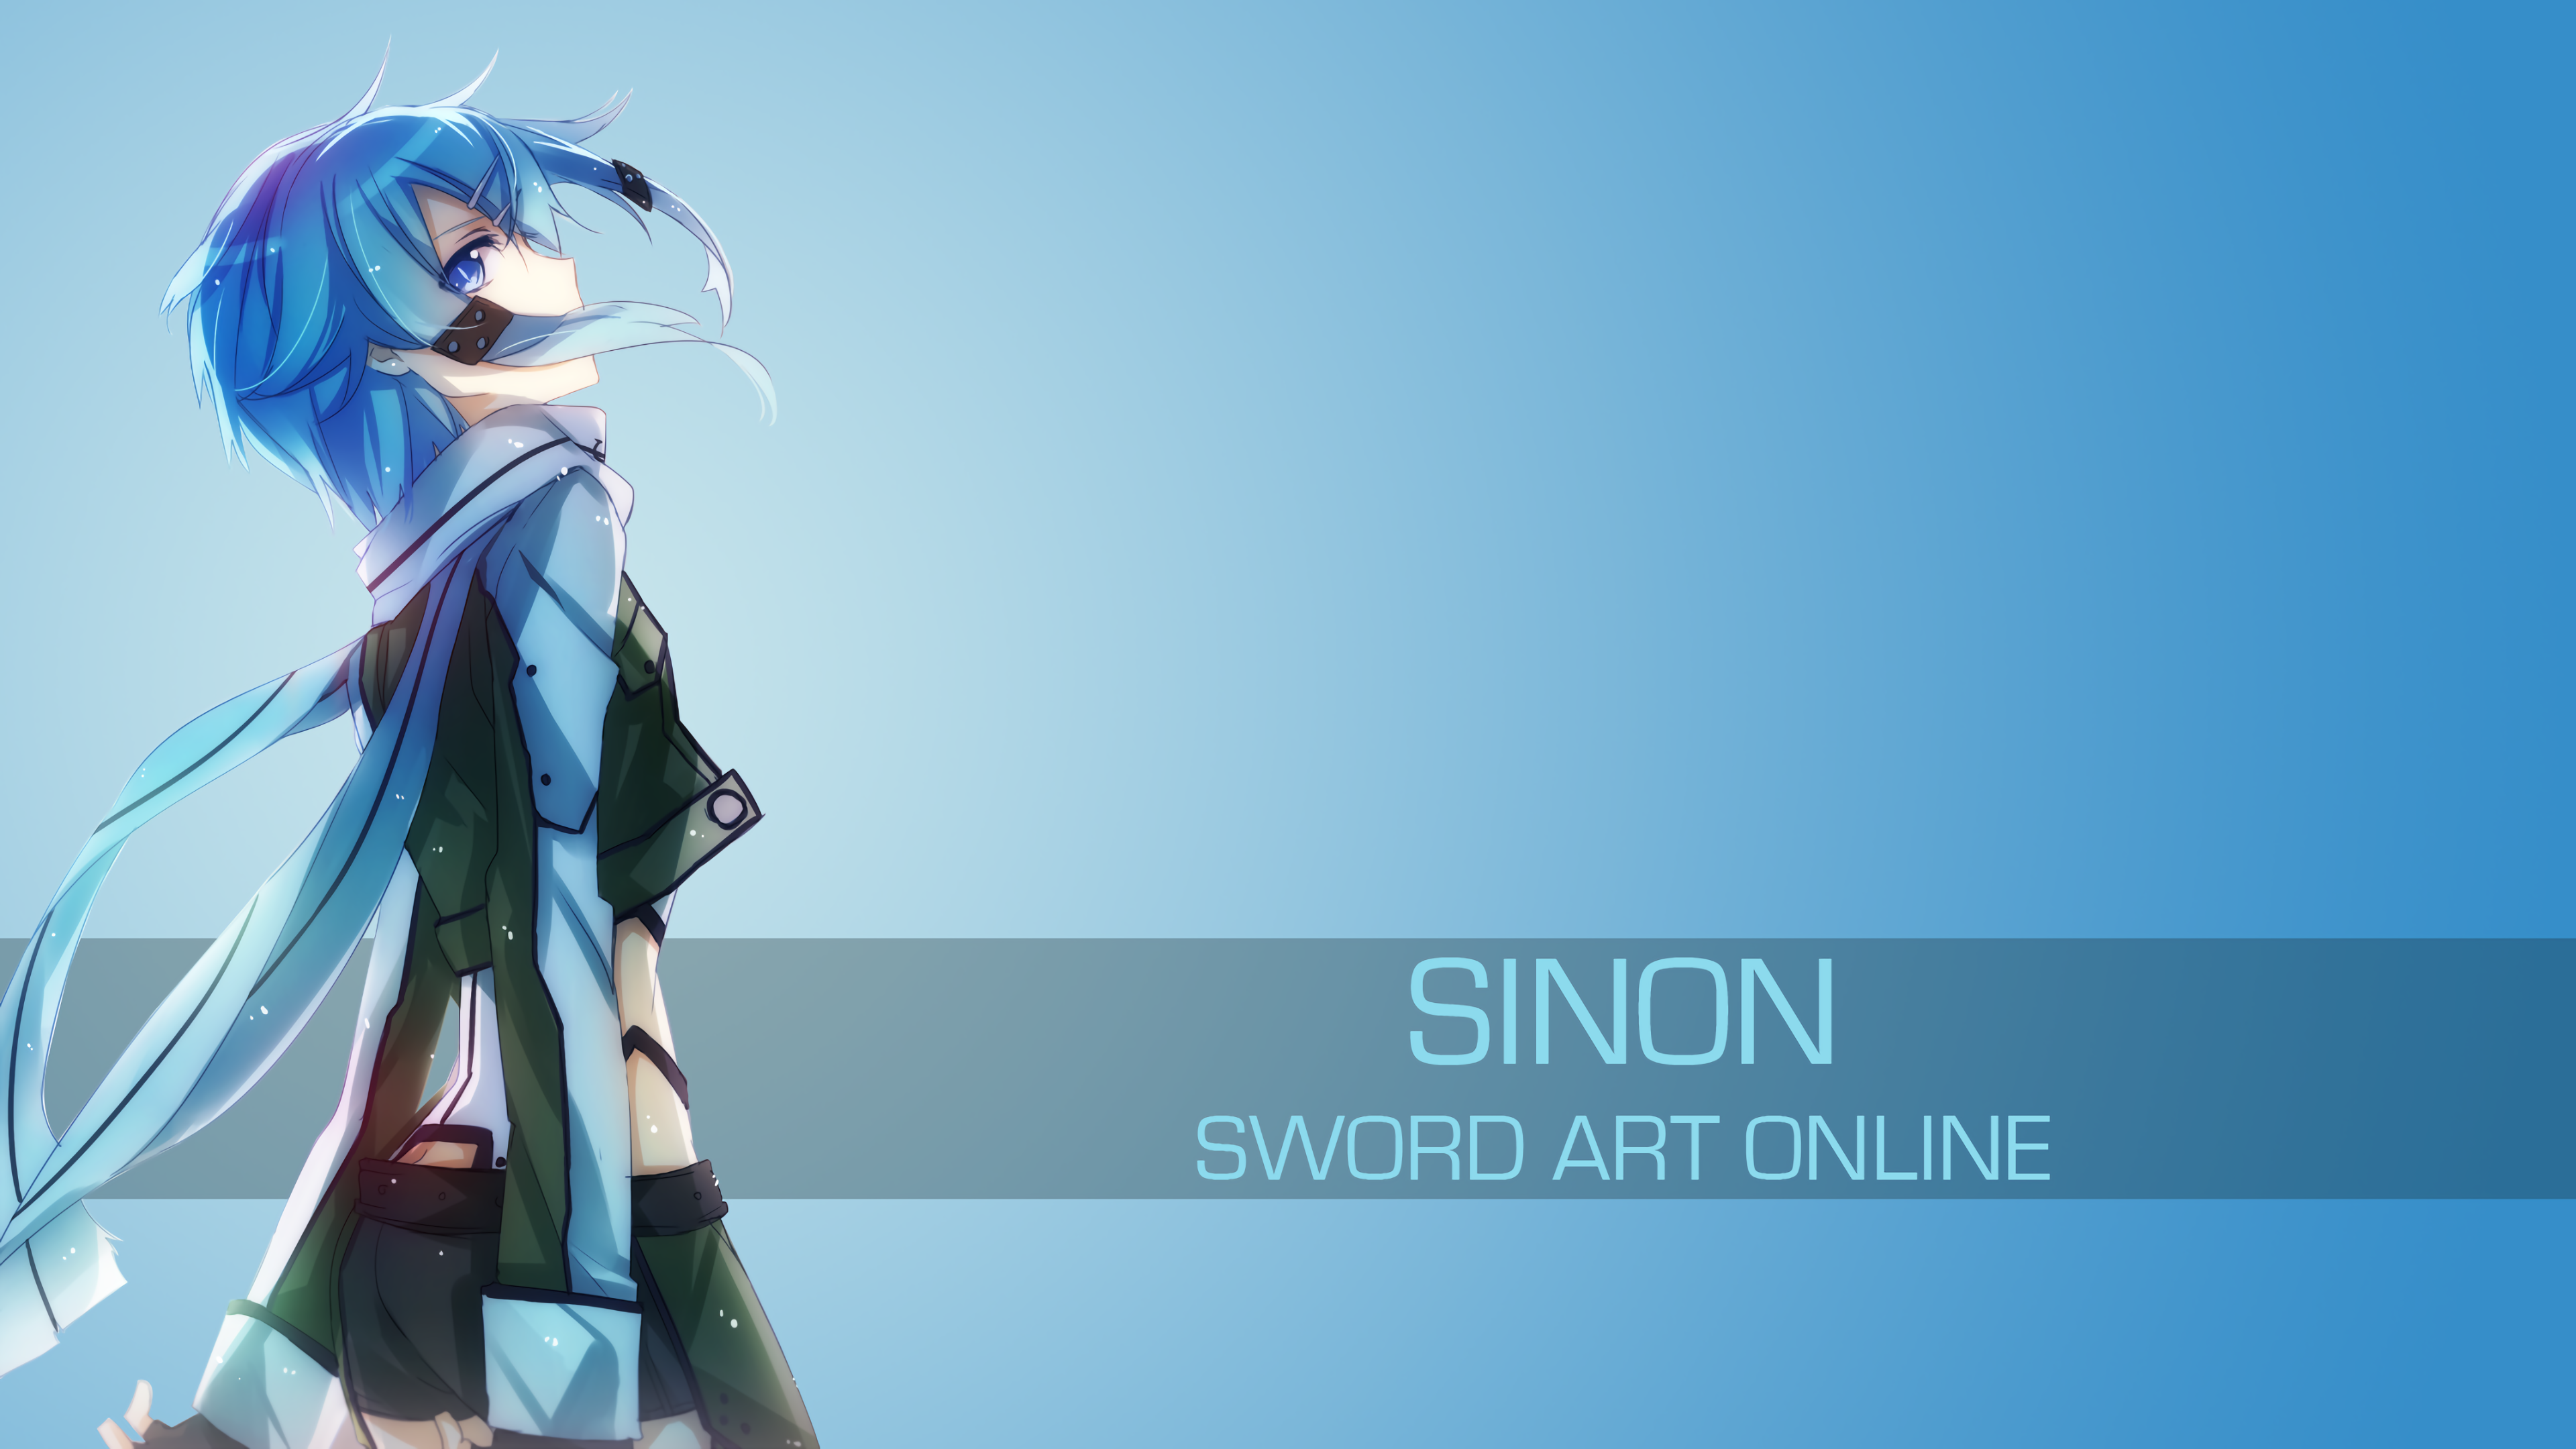 Sword Art Online-Sinon 1 by spectralfire234 on DeviantArt